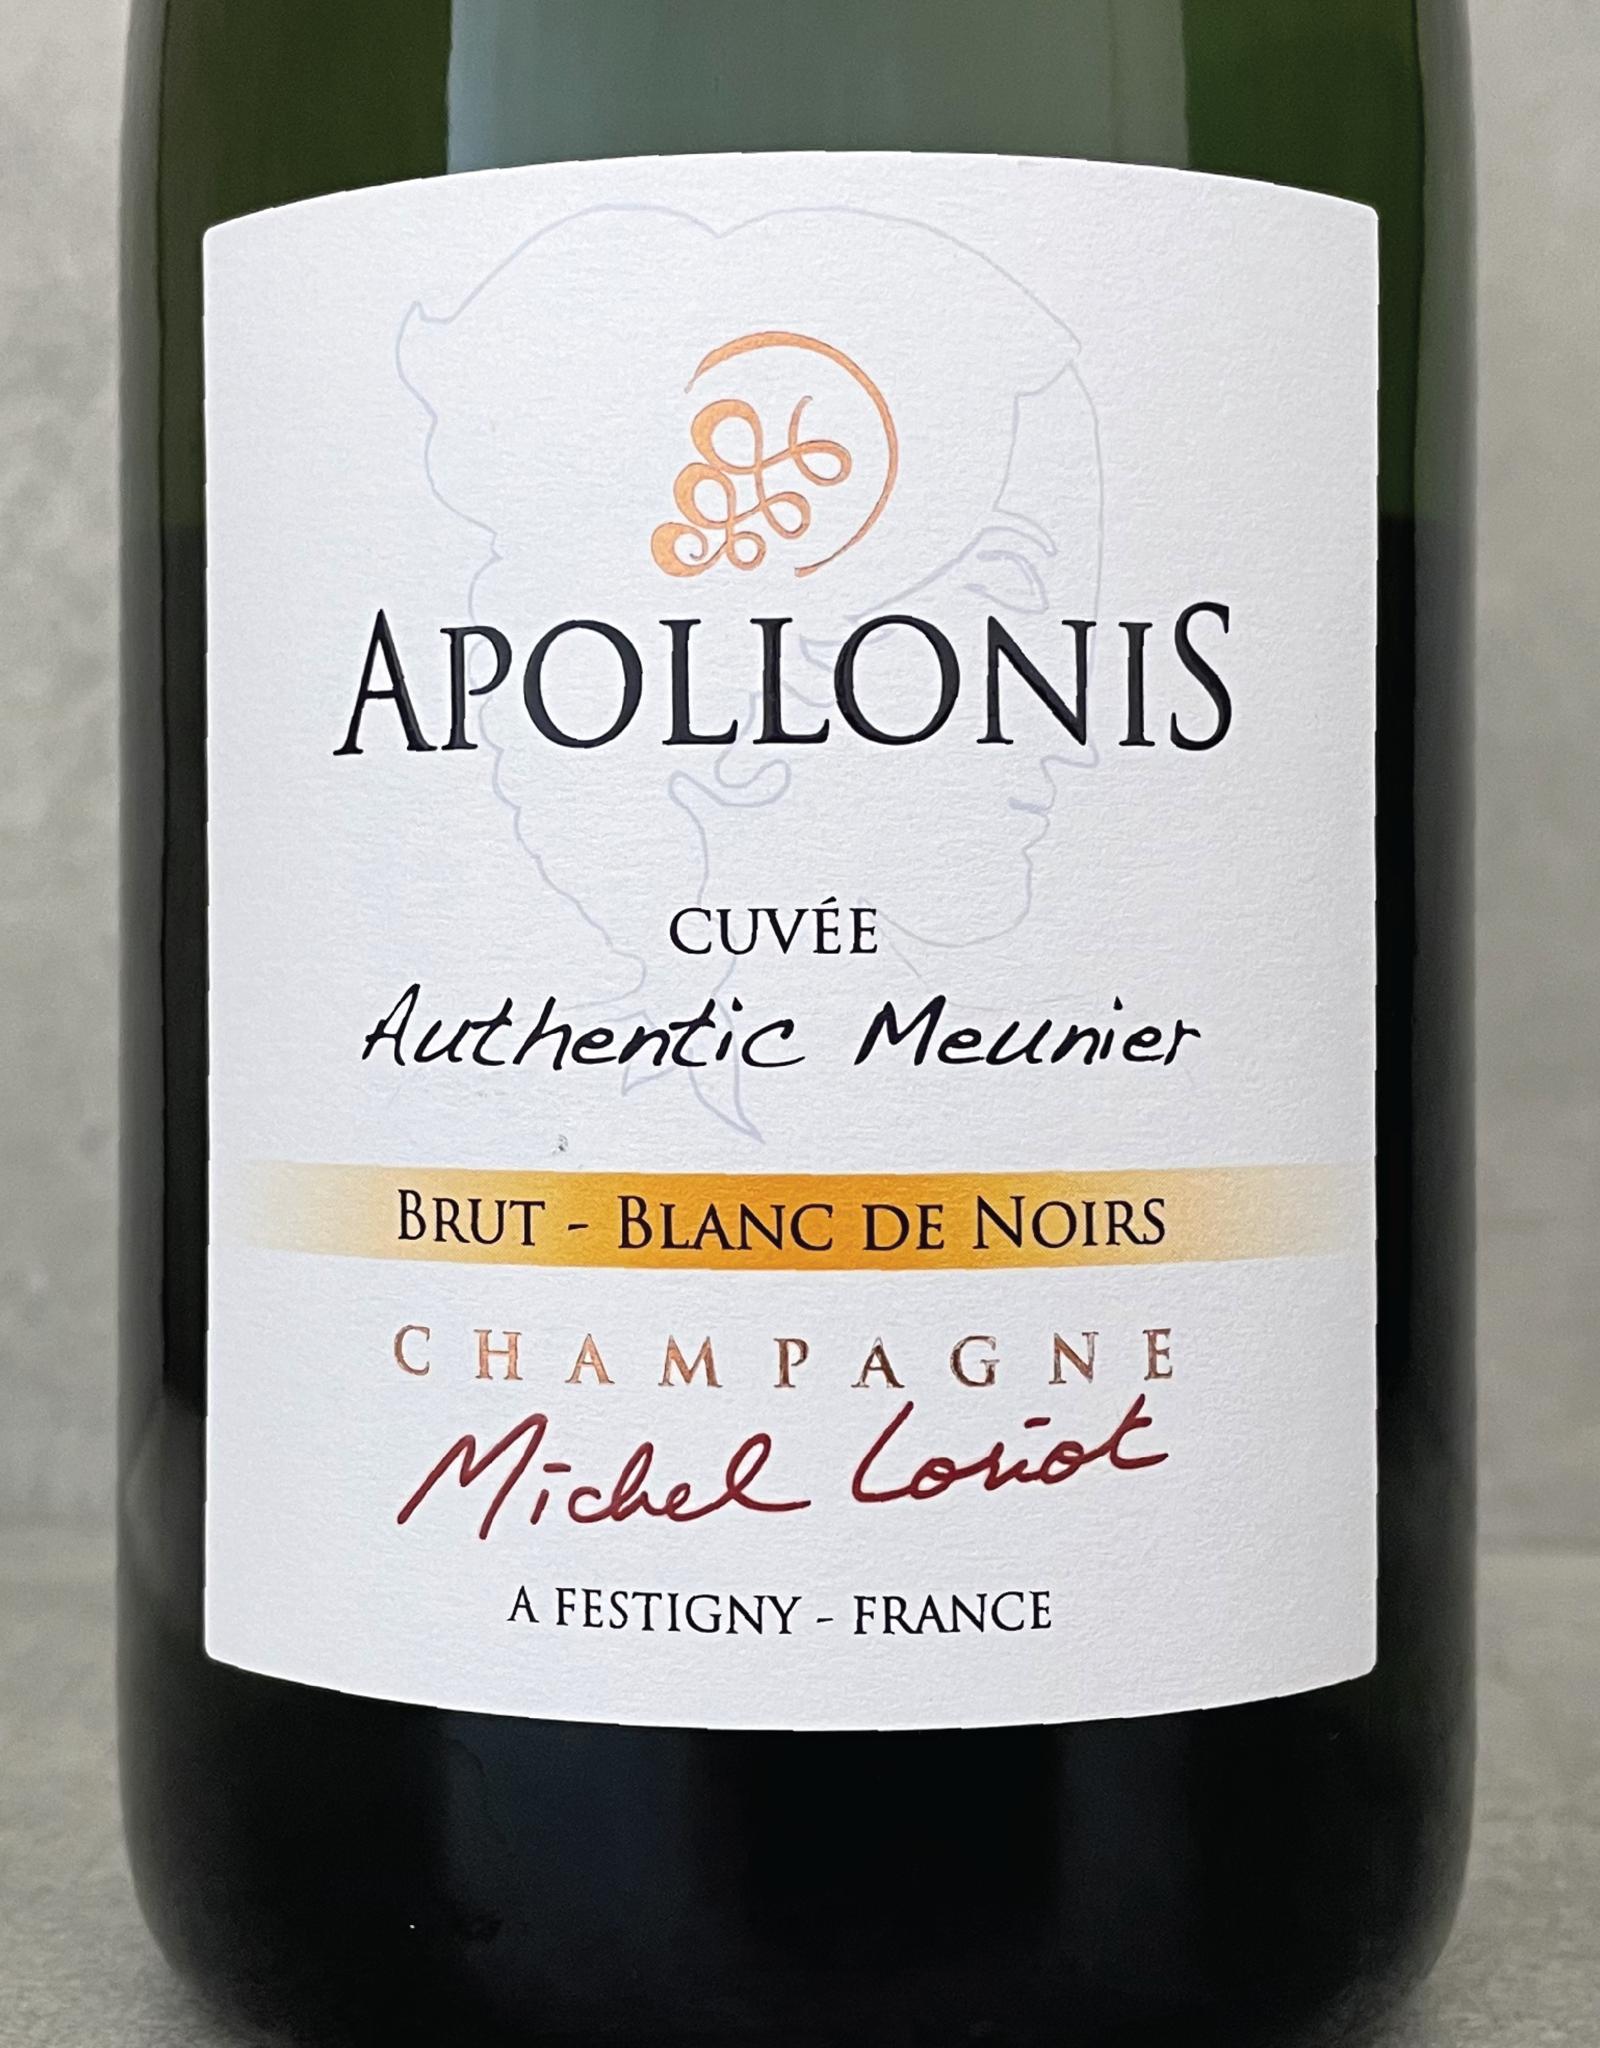 Apollonis Authentic Meunier n.v.